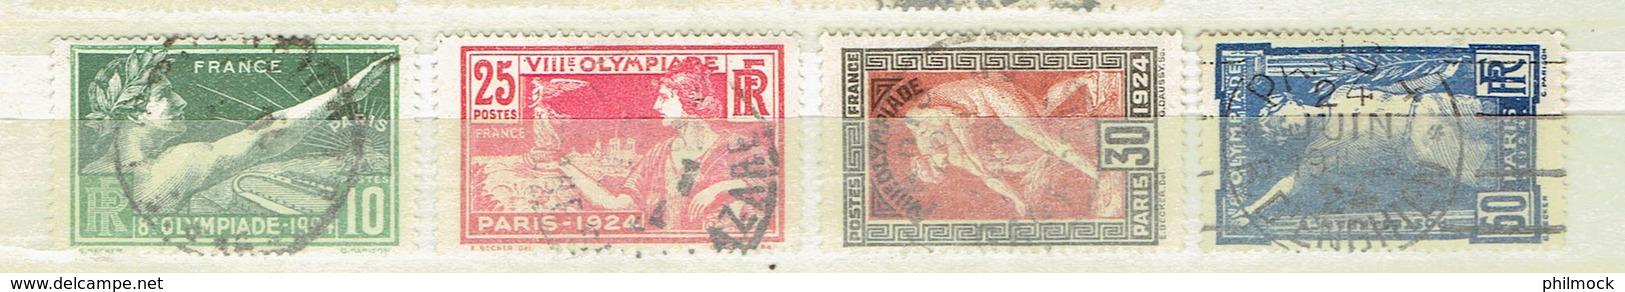 234P - France - N°183-186 - Oblitérés